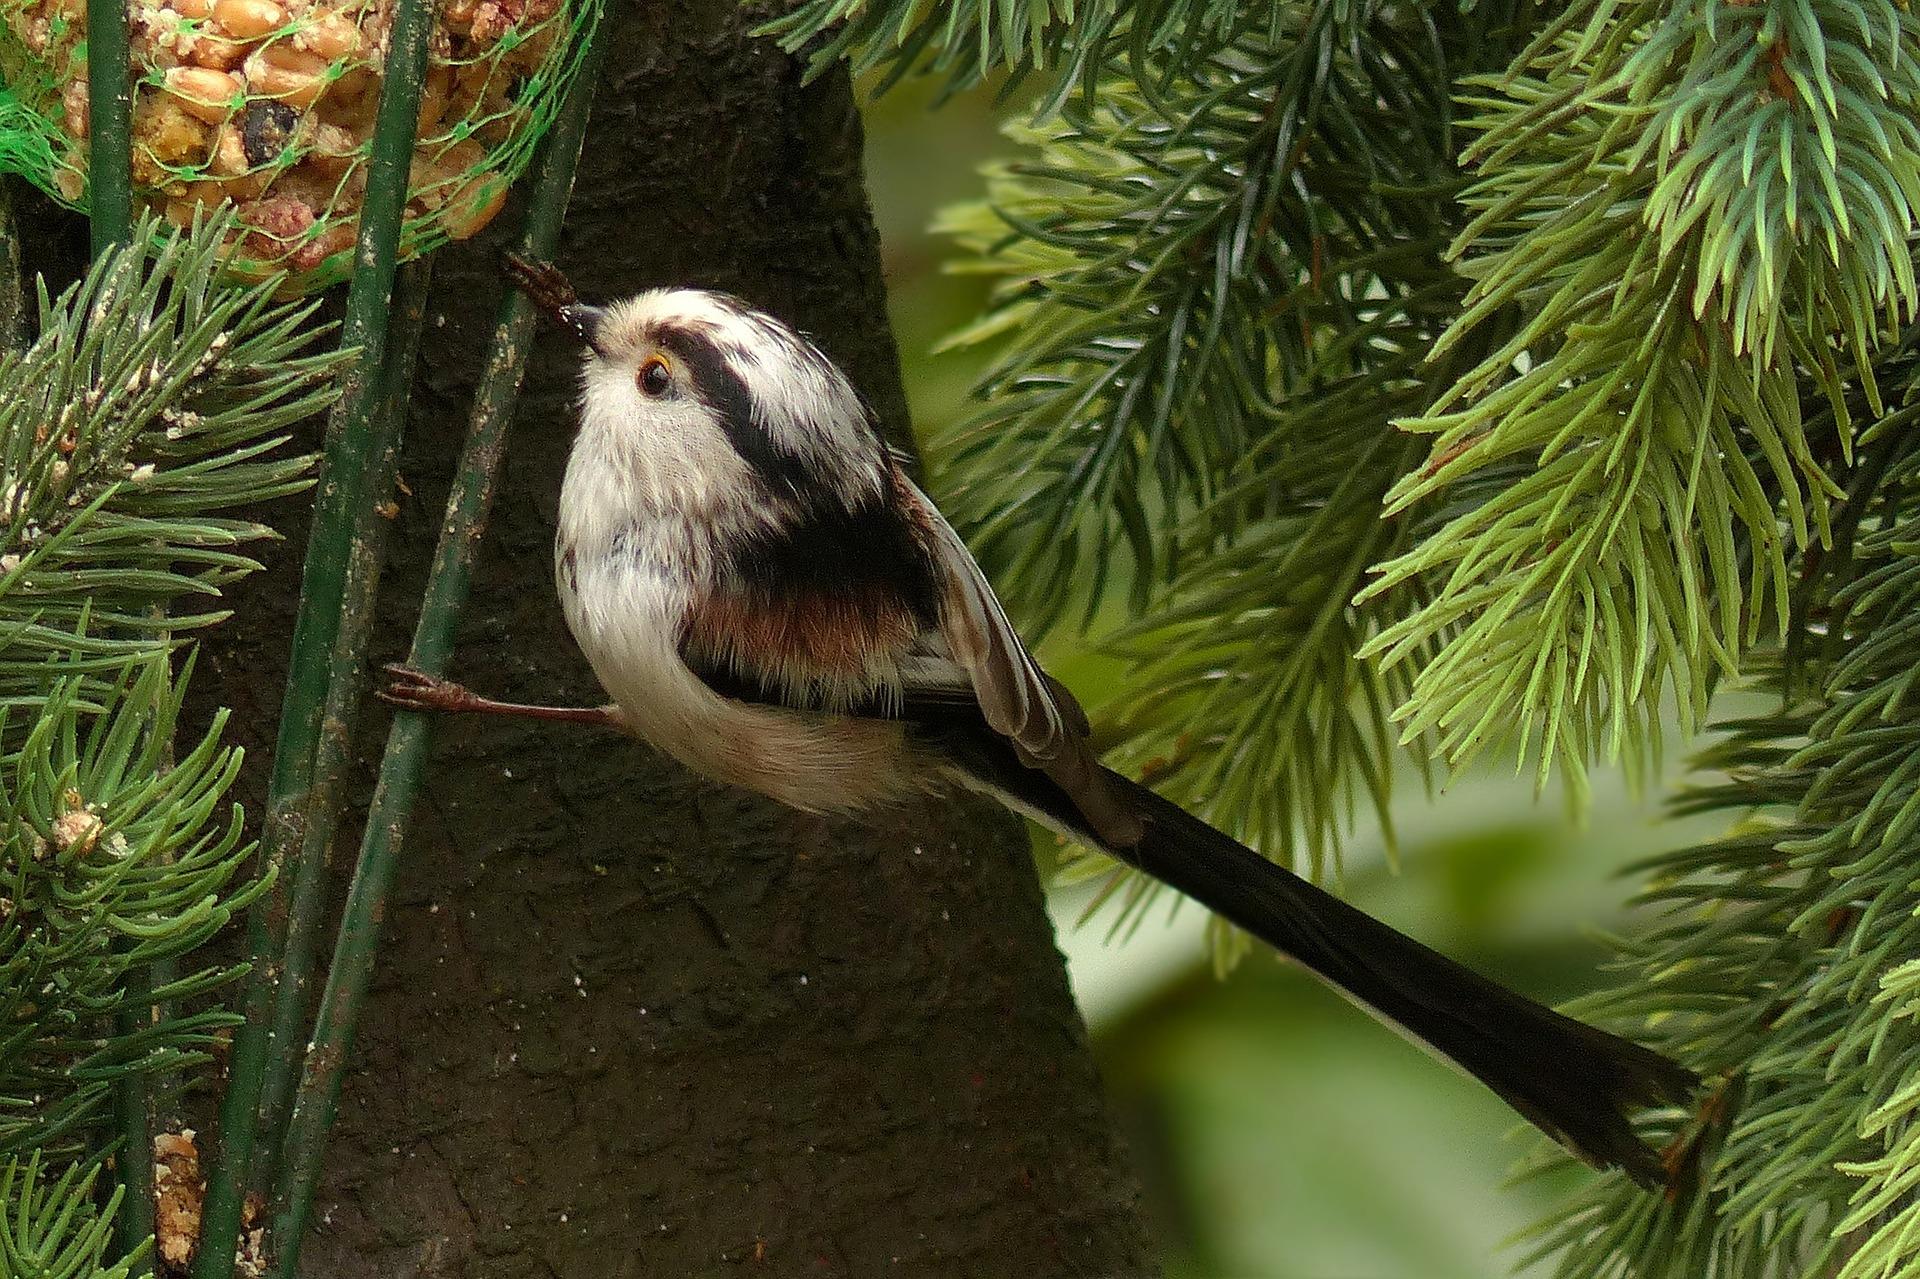 bird-675131_1920.jpg